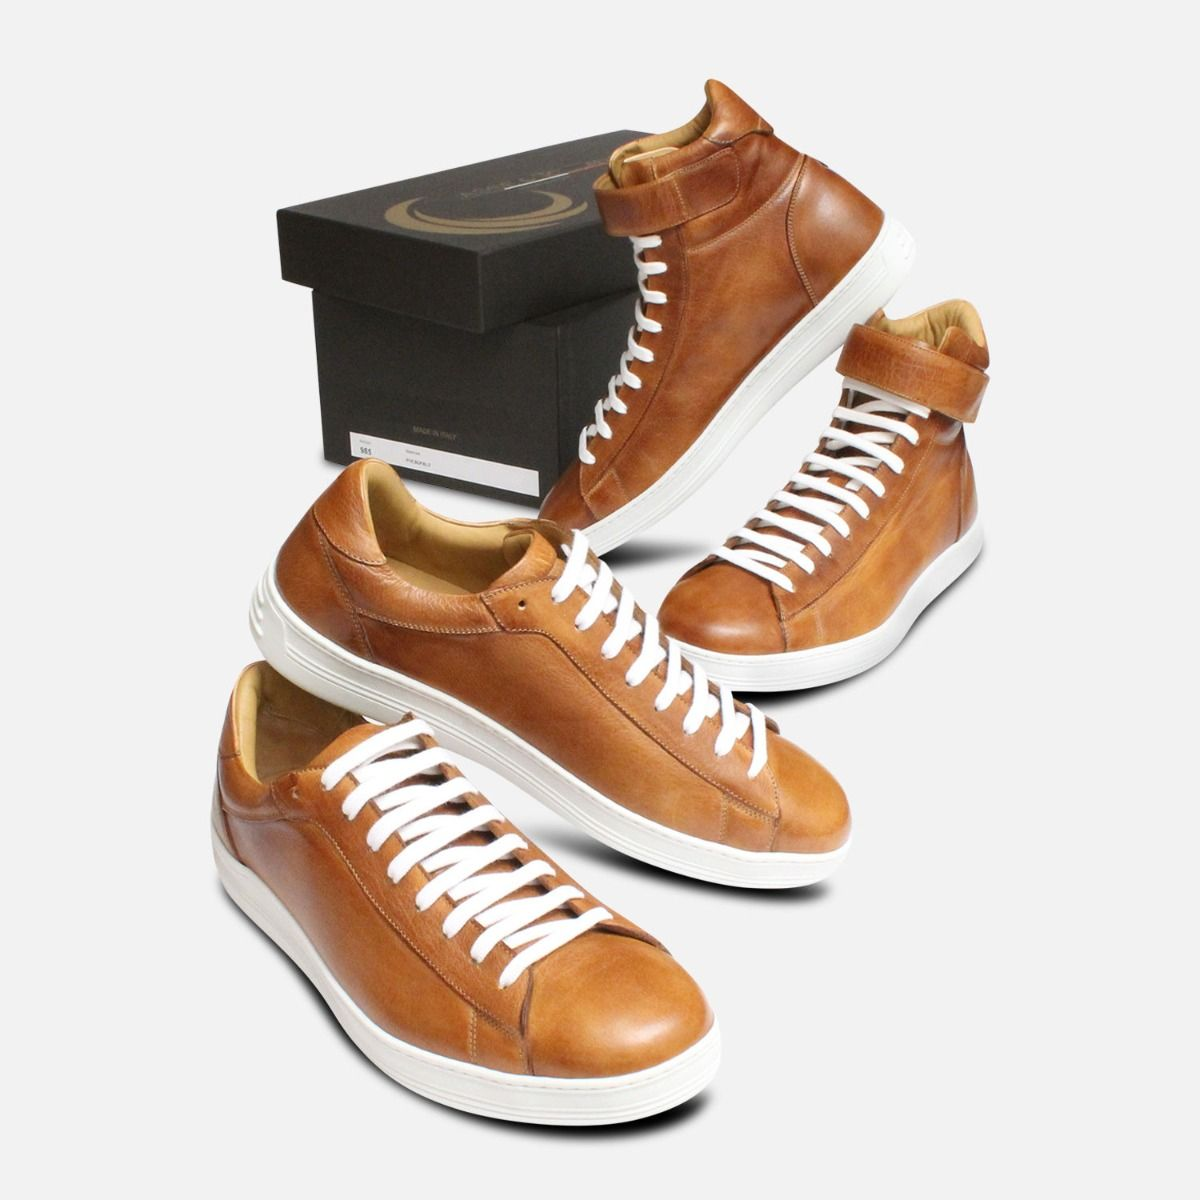 Luxury Buffalino Leather Designer Sneakers